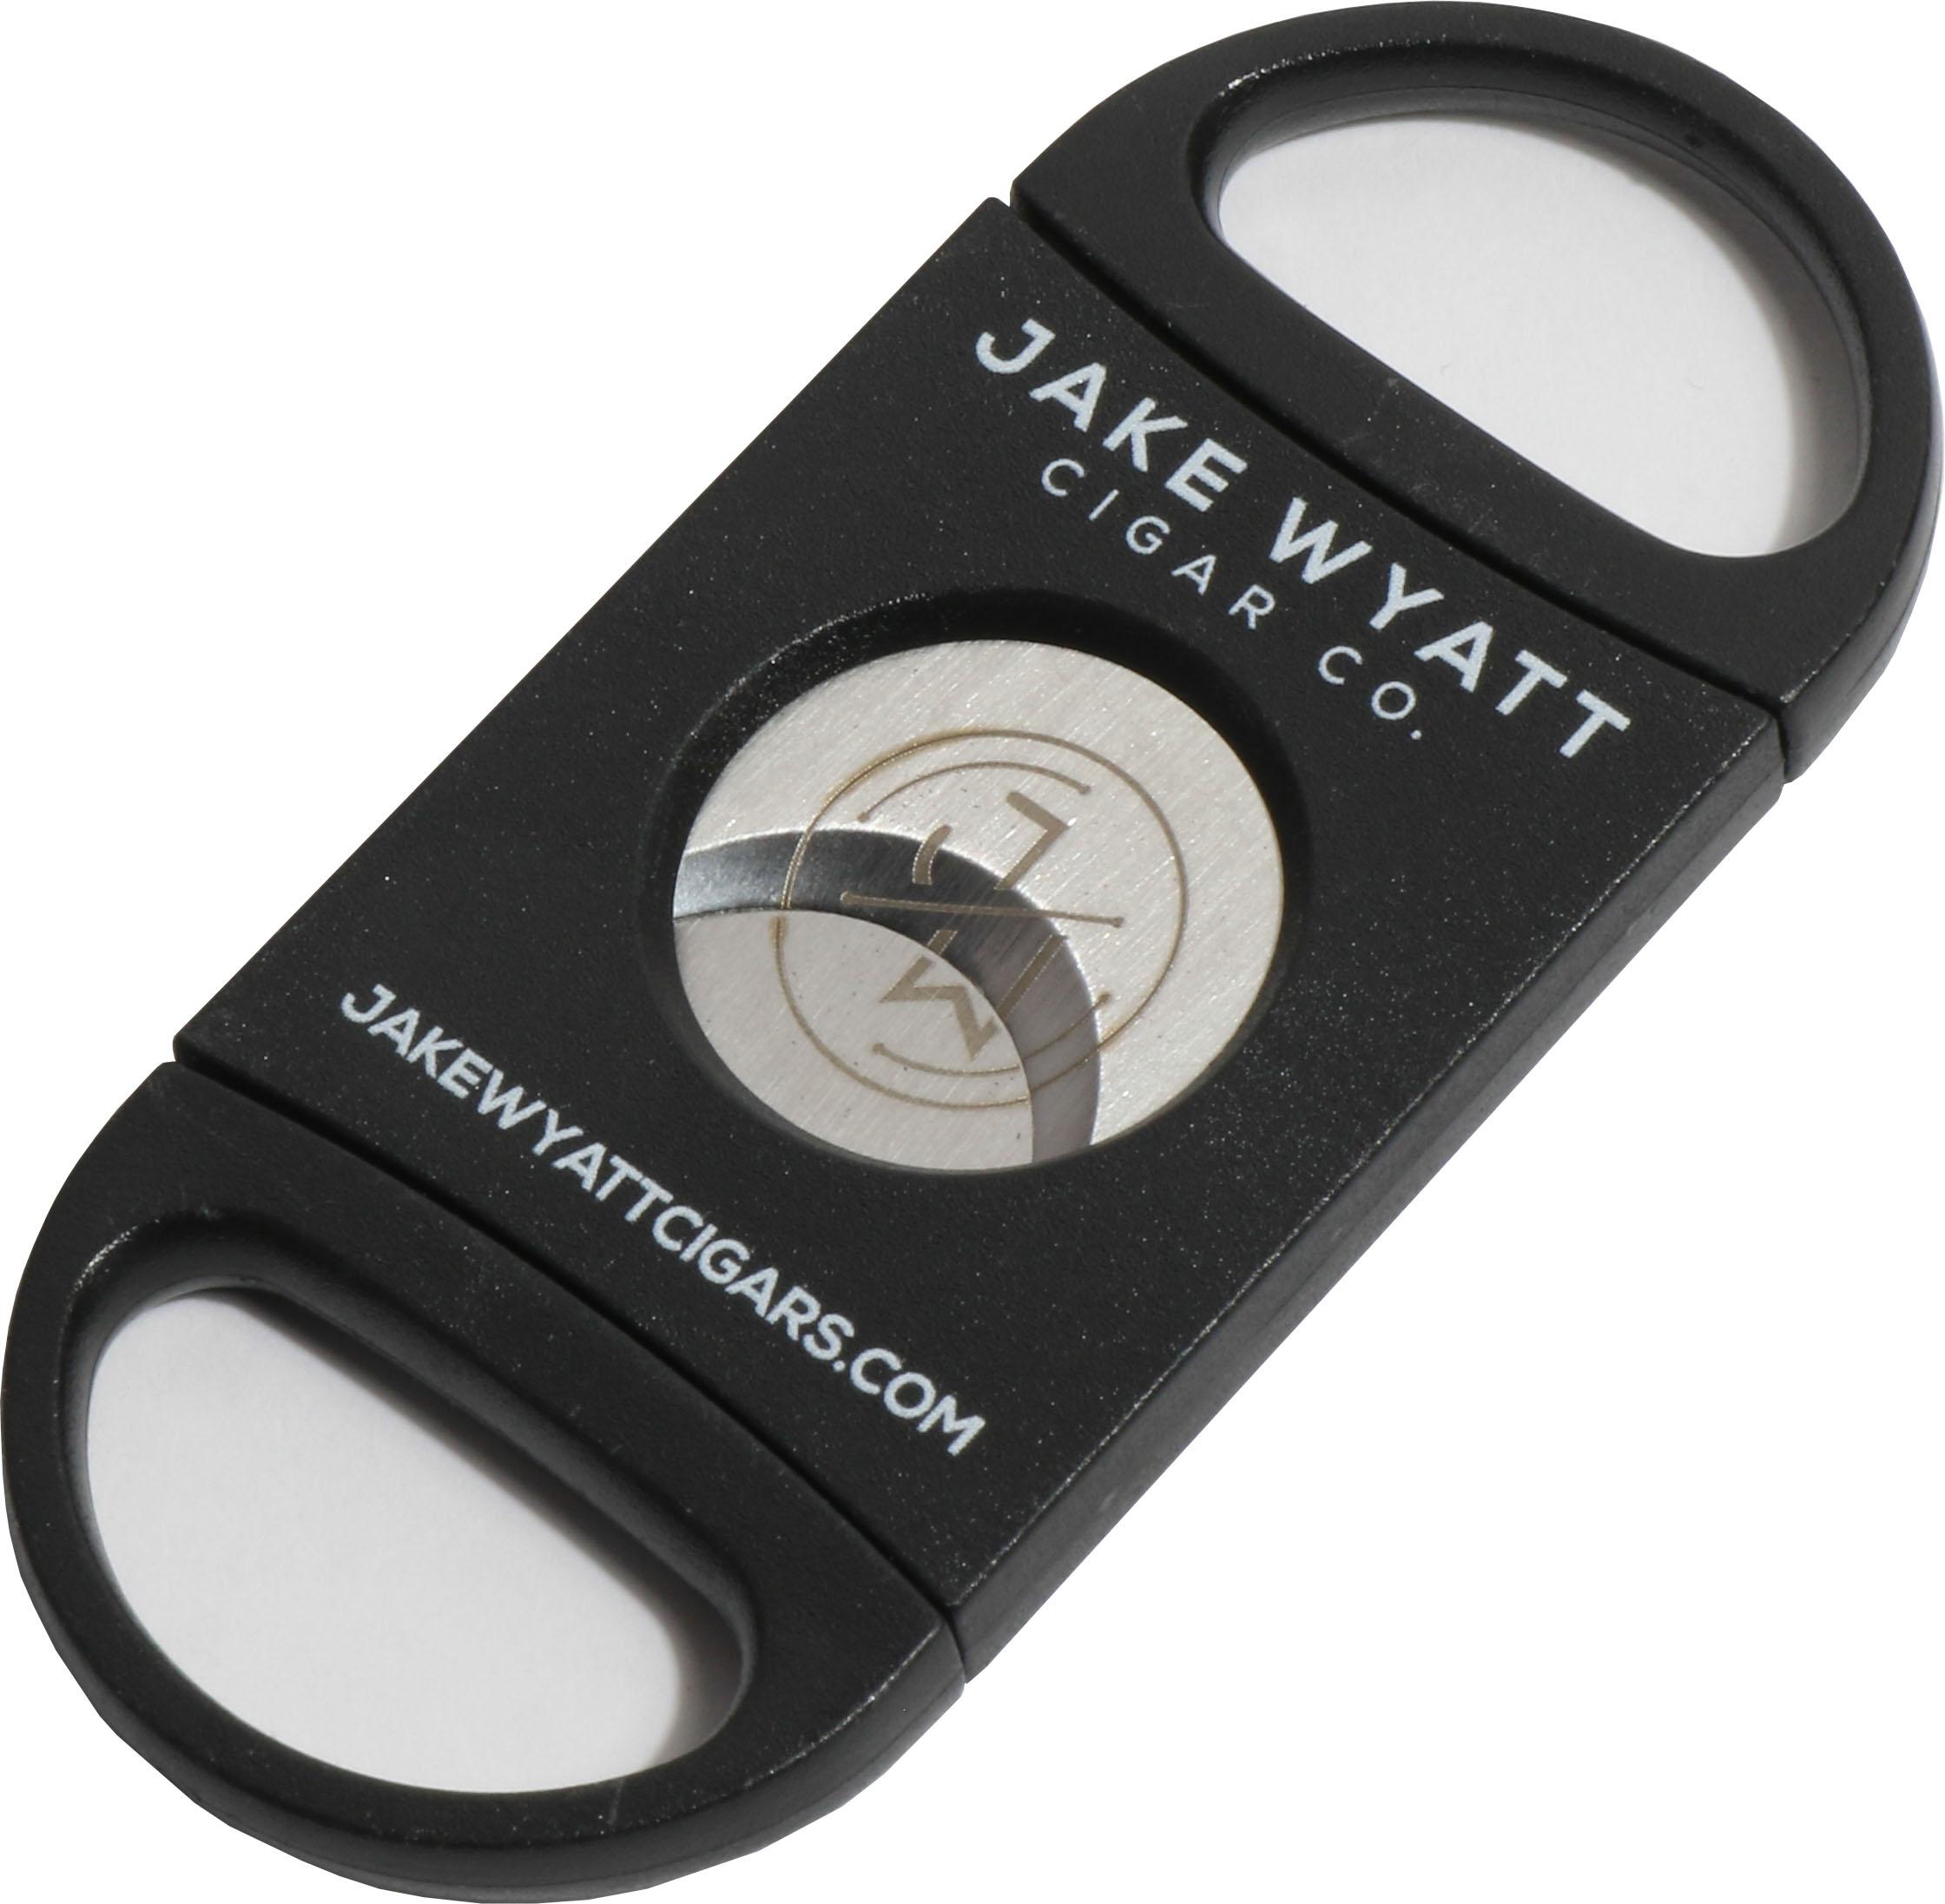 Jake Wyatt Cigar Co. - Cutter